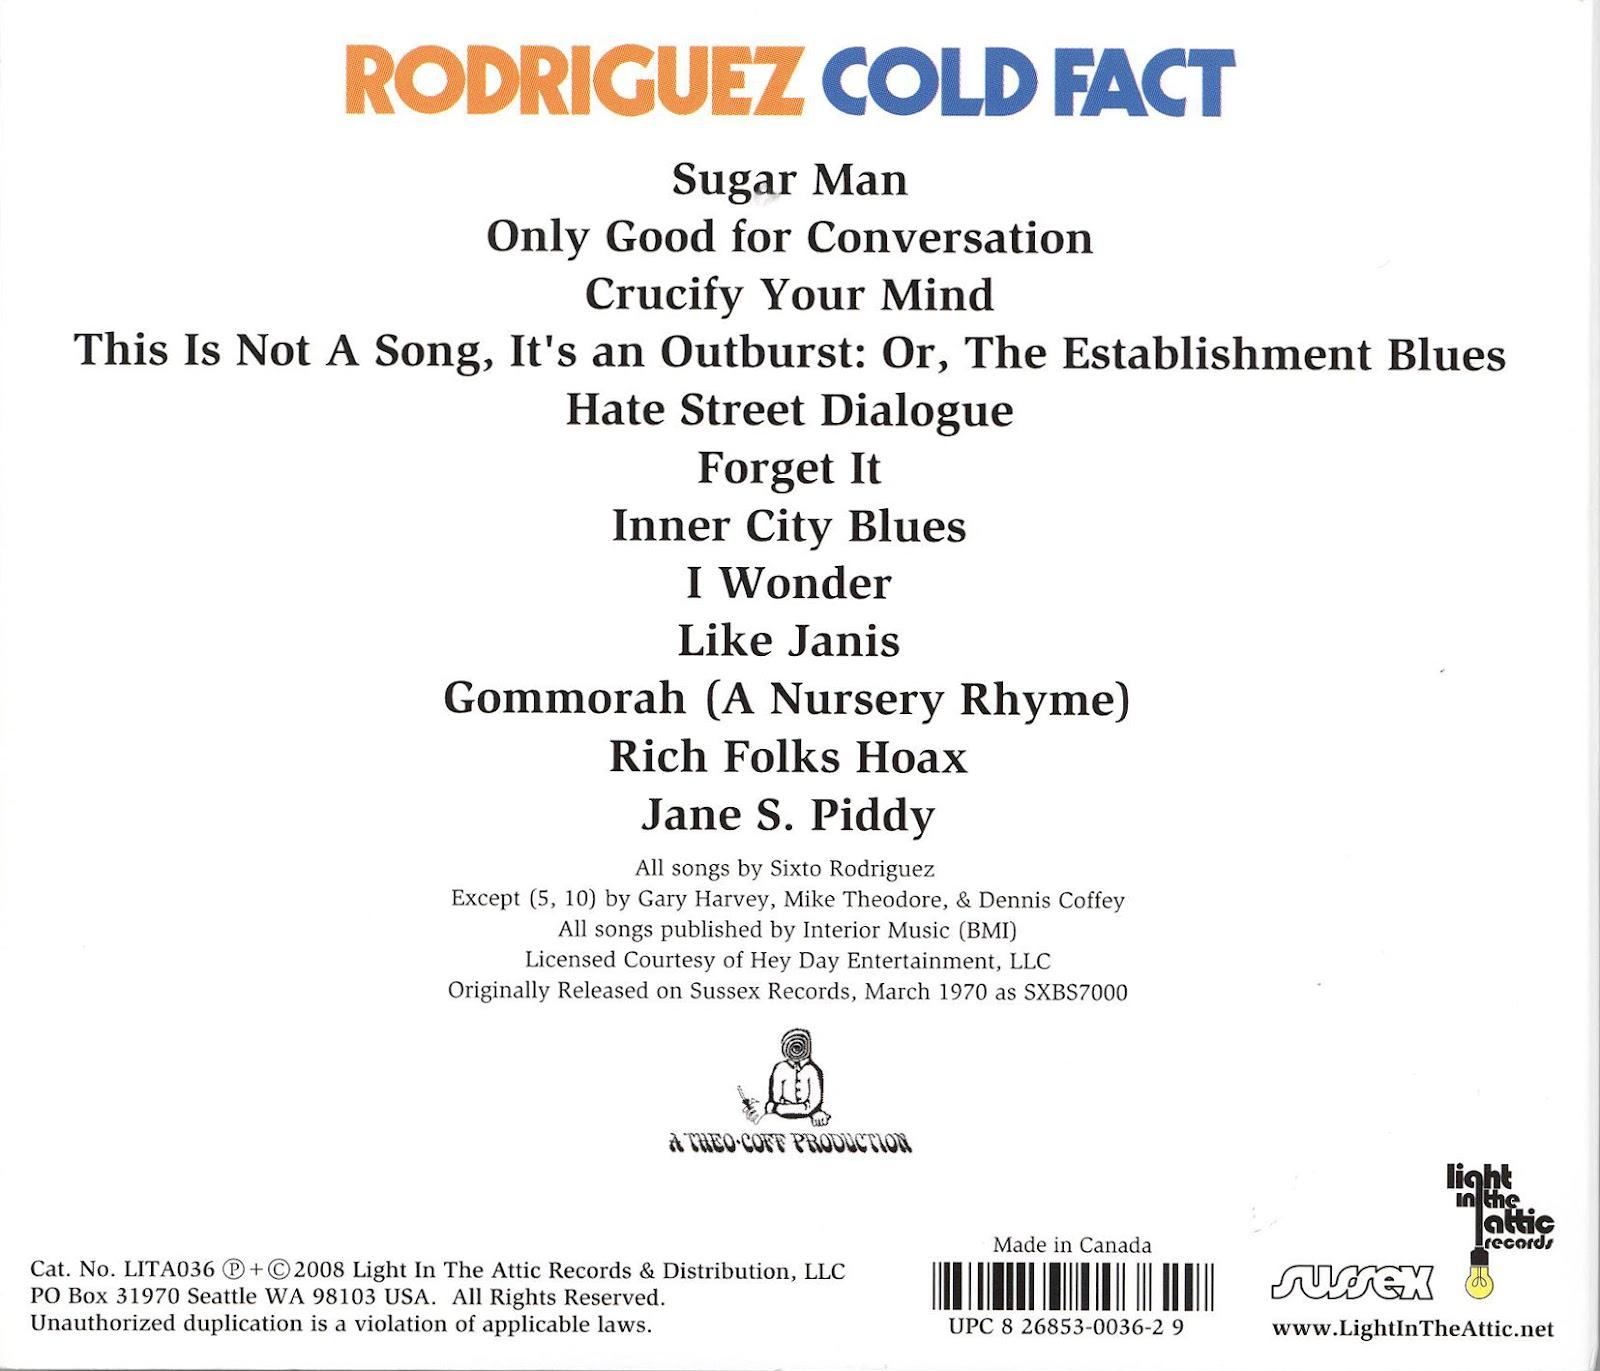 Rodriguez Live Fact